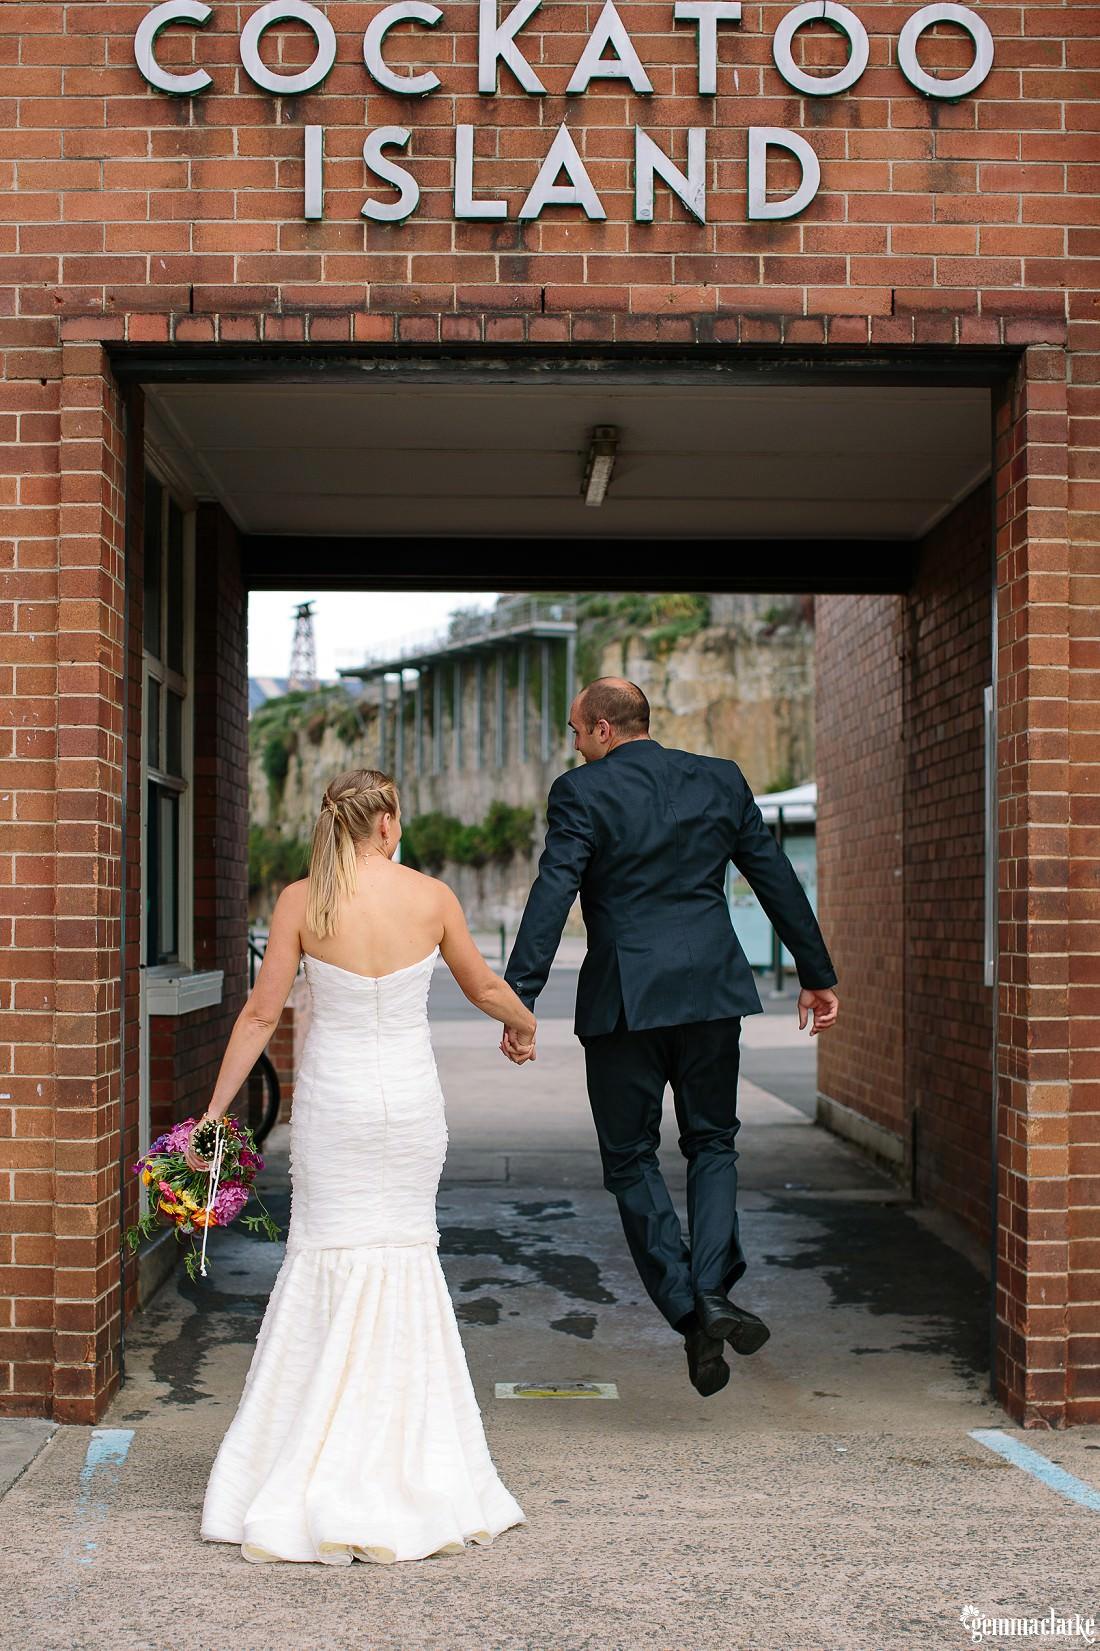 gemmaclarkephotography_cockatoo-island-wedding-photos_the-bar-at-the-end-of-the-wharf_0069